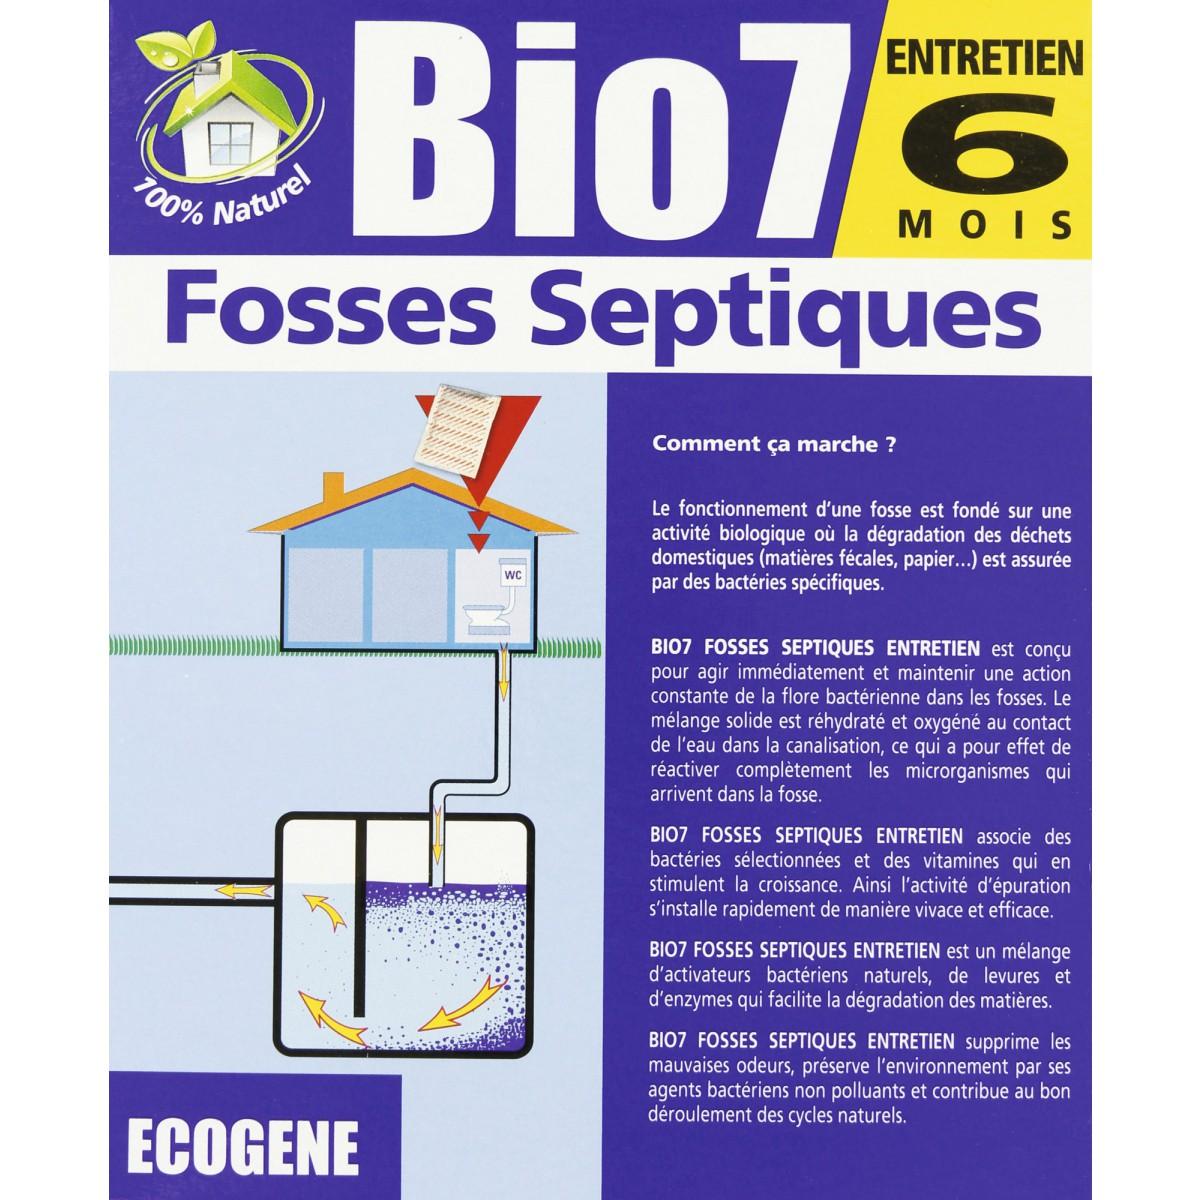 Bio 7 entretien fosses ecog ne 480 g 6 sachets de entretien fosse septique - Entretien fosse septique ...